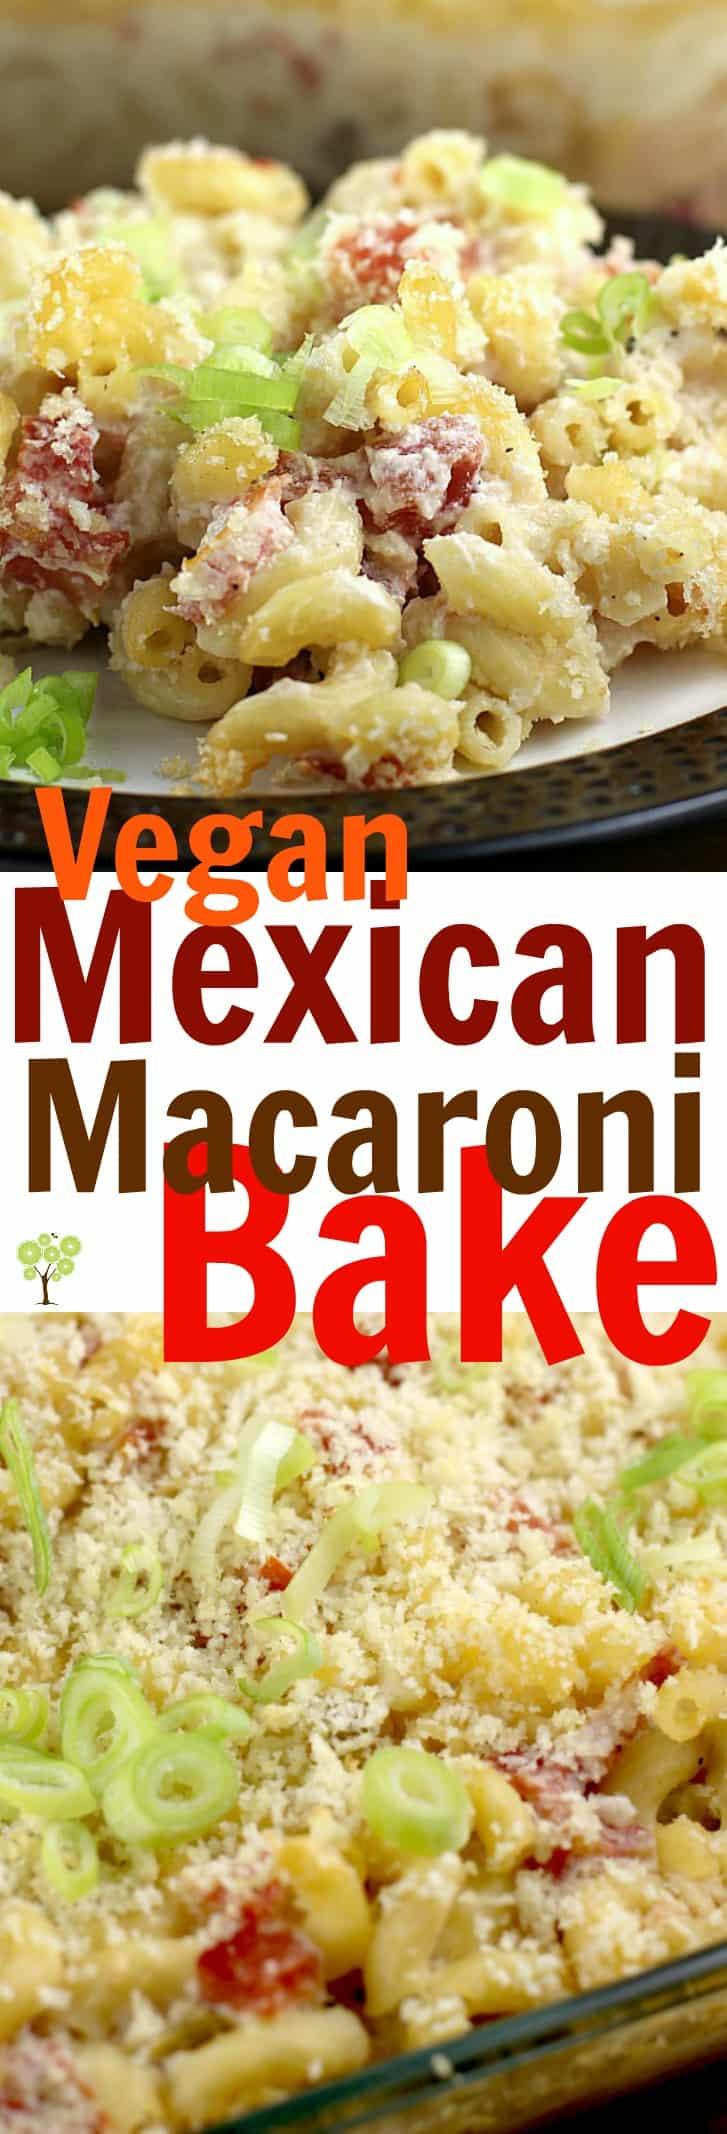 Vegan Mexican Macaroni Bake #31DaysWithRotel #ad @Walmart @ro_tel